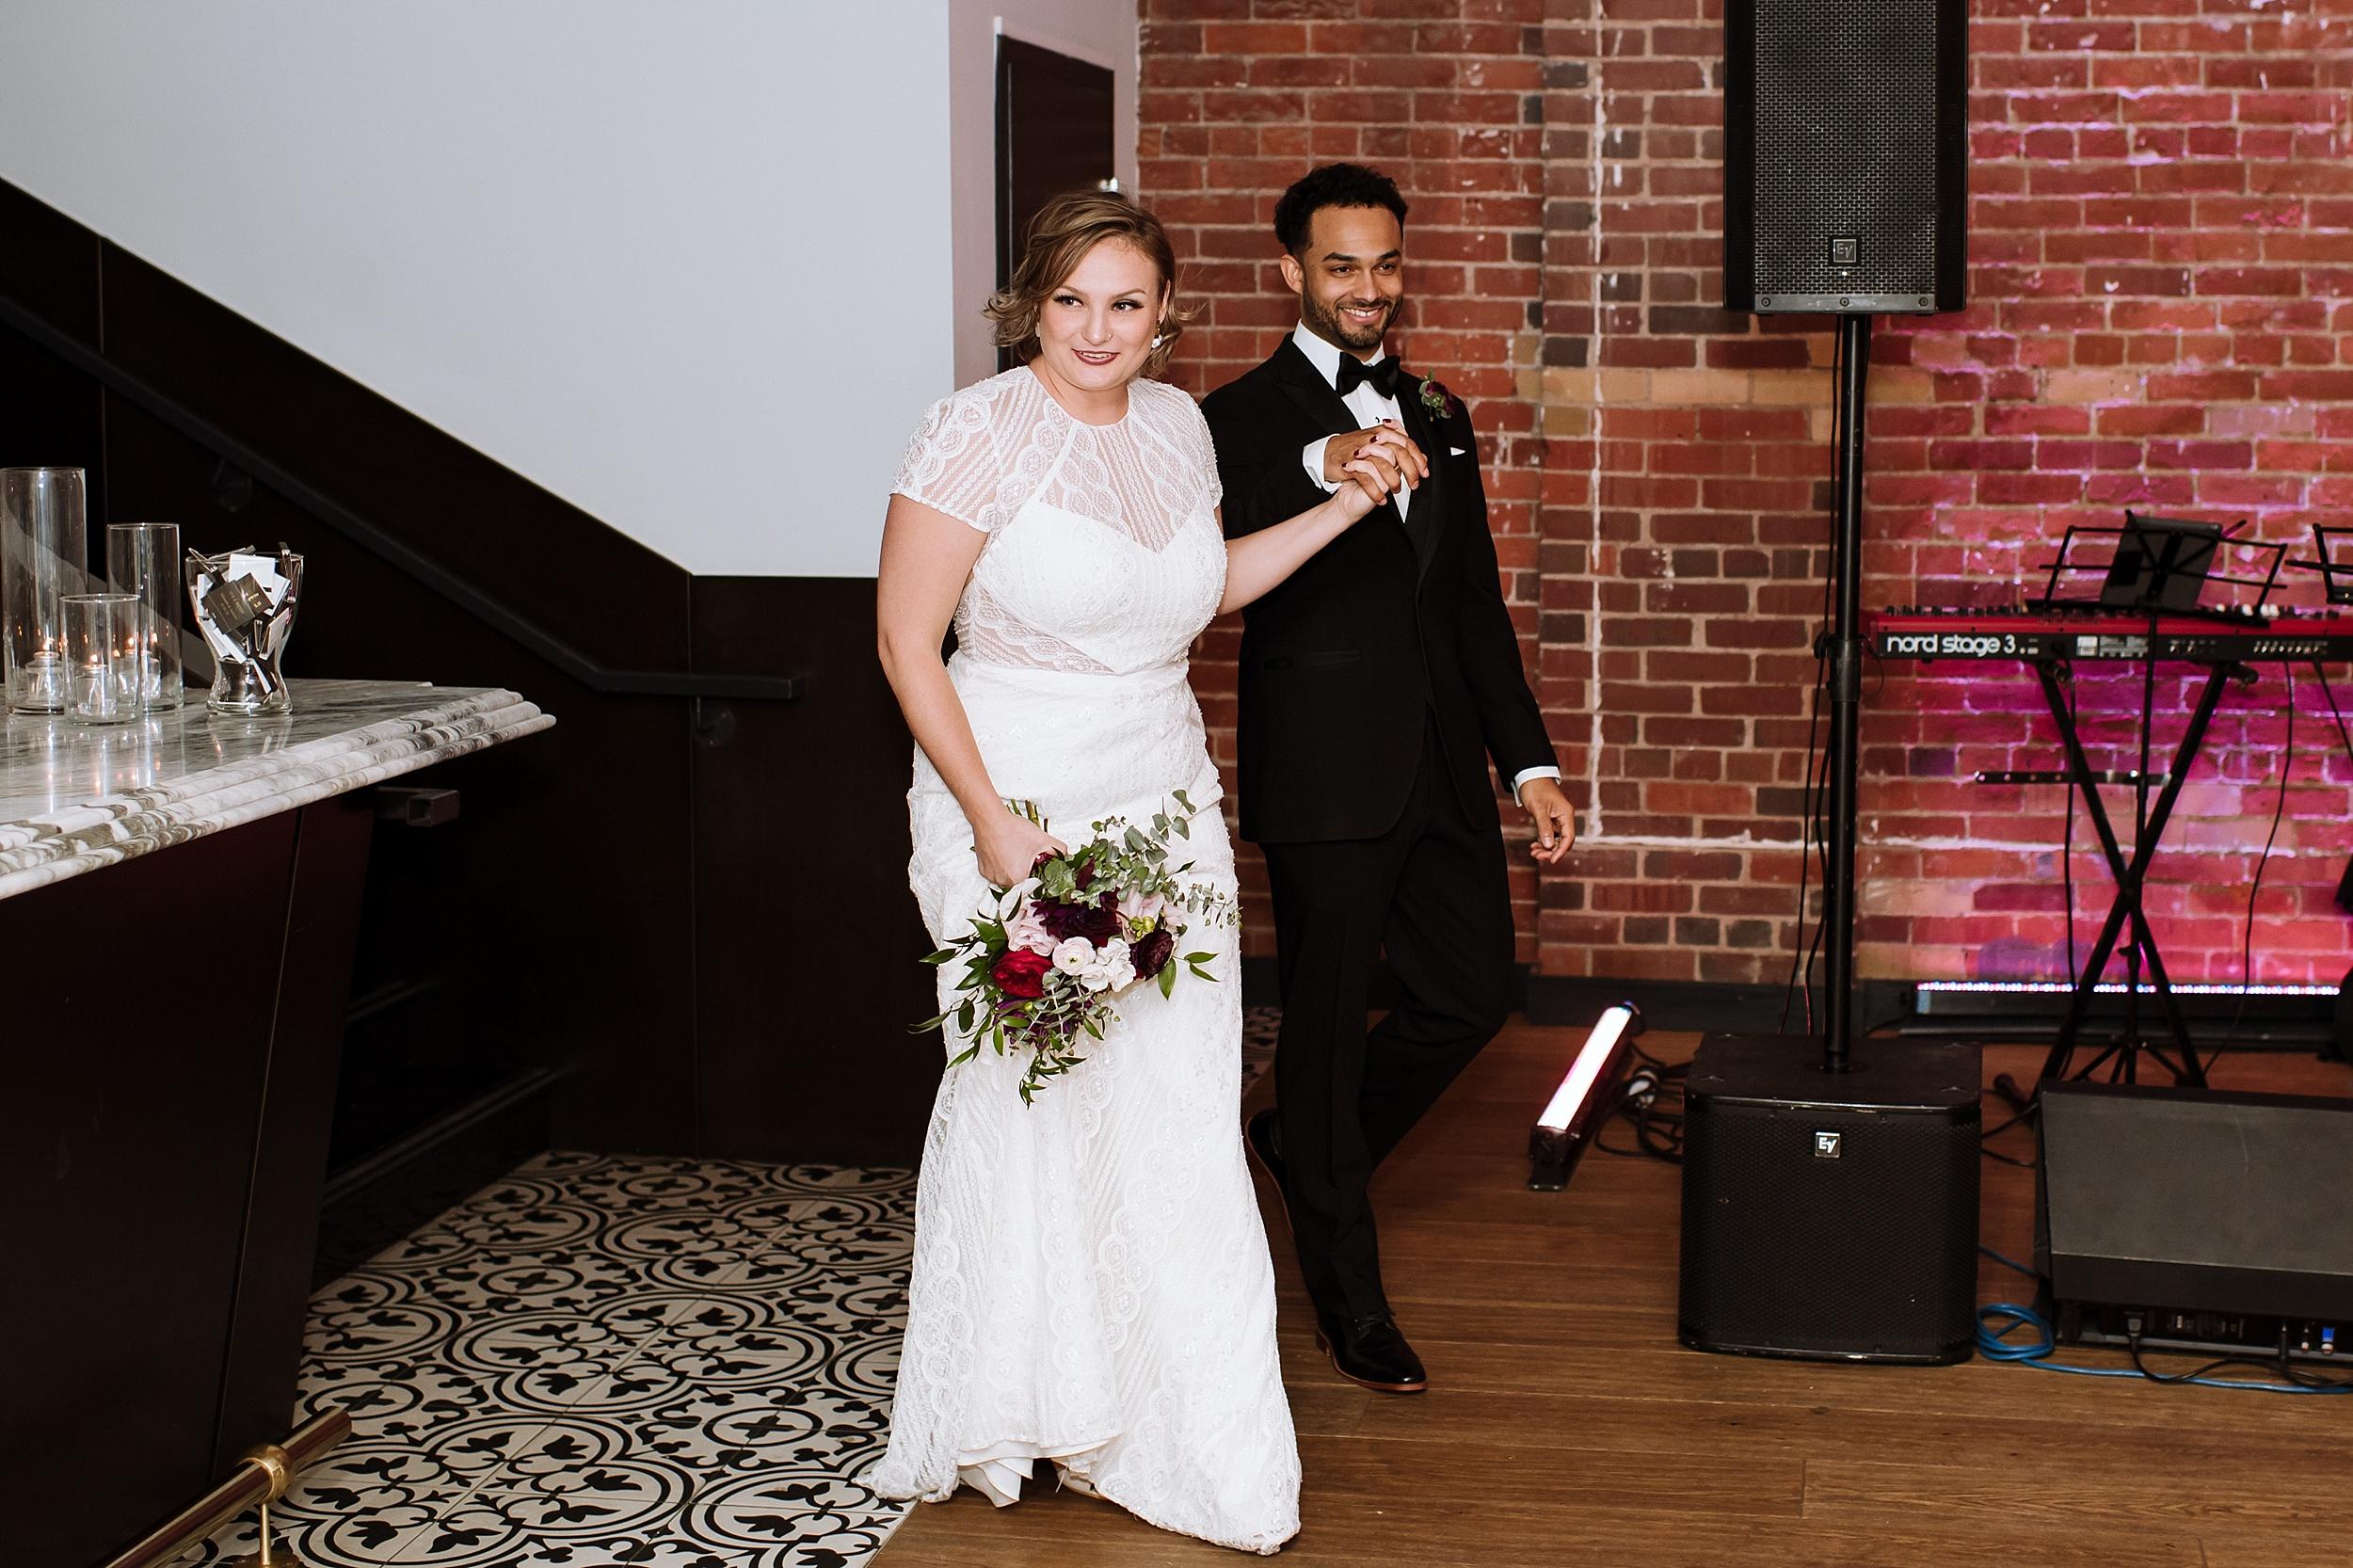 Broadview_Hotel_Wedding_Toronto_Photographer_0048.jpg